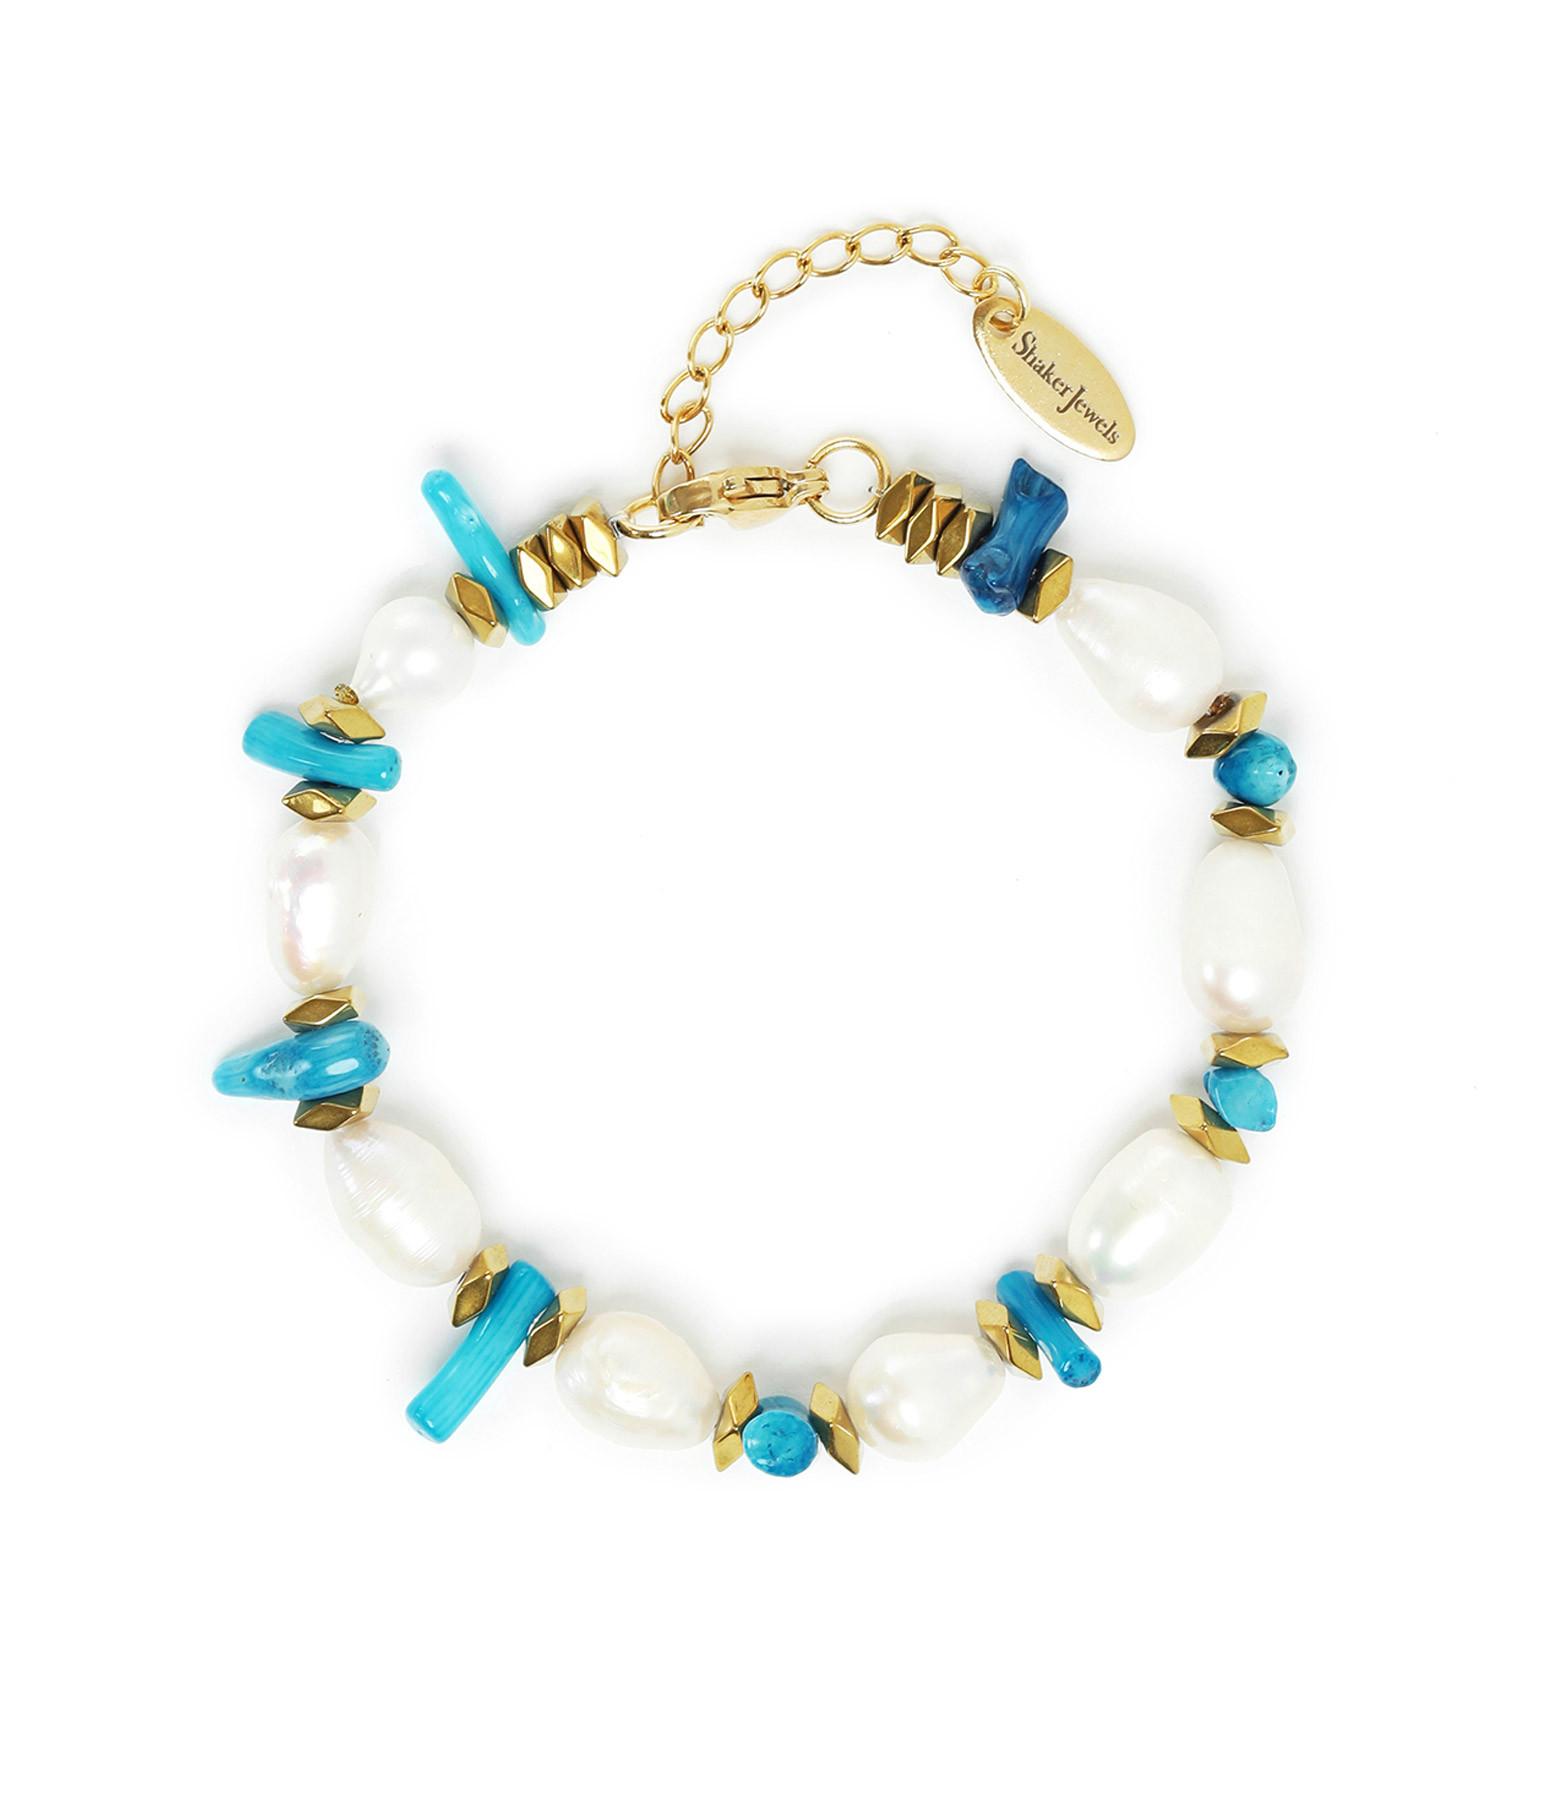 SHAKER JEWELS - Bracelet Turquoise Perles Plaqué Or